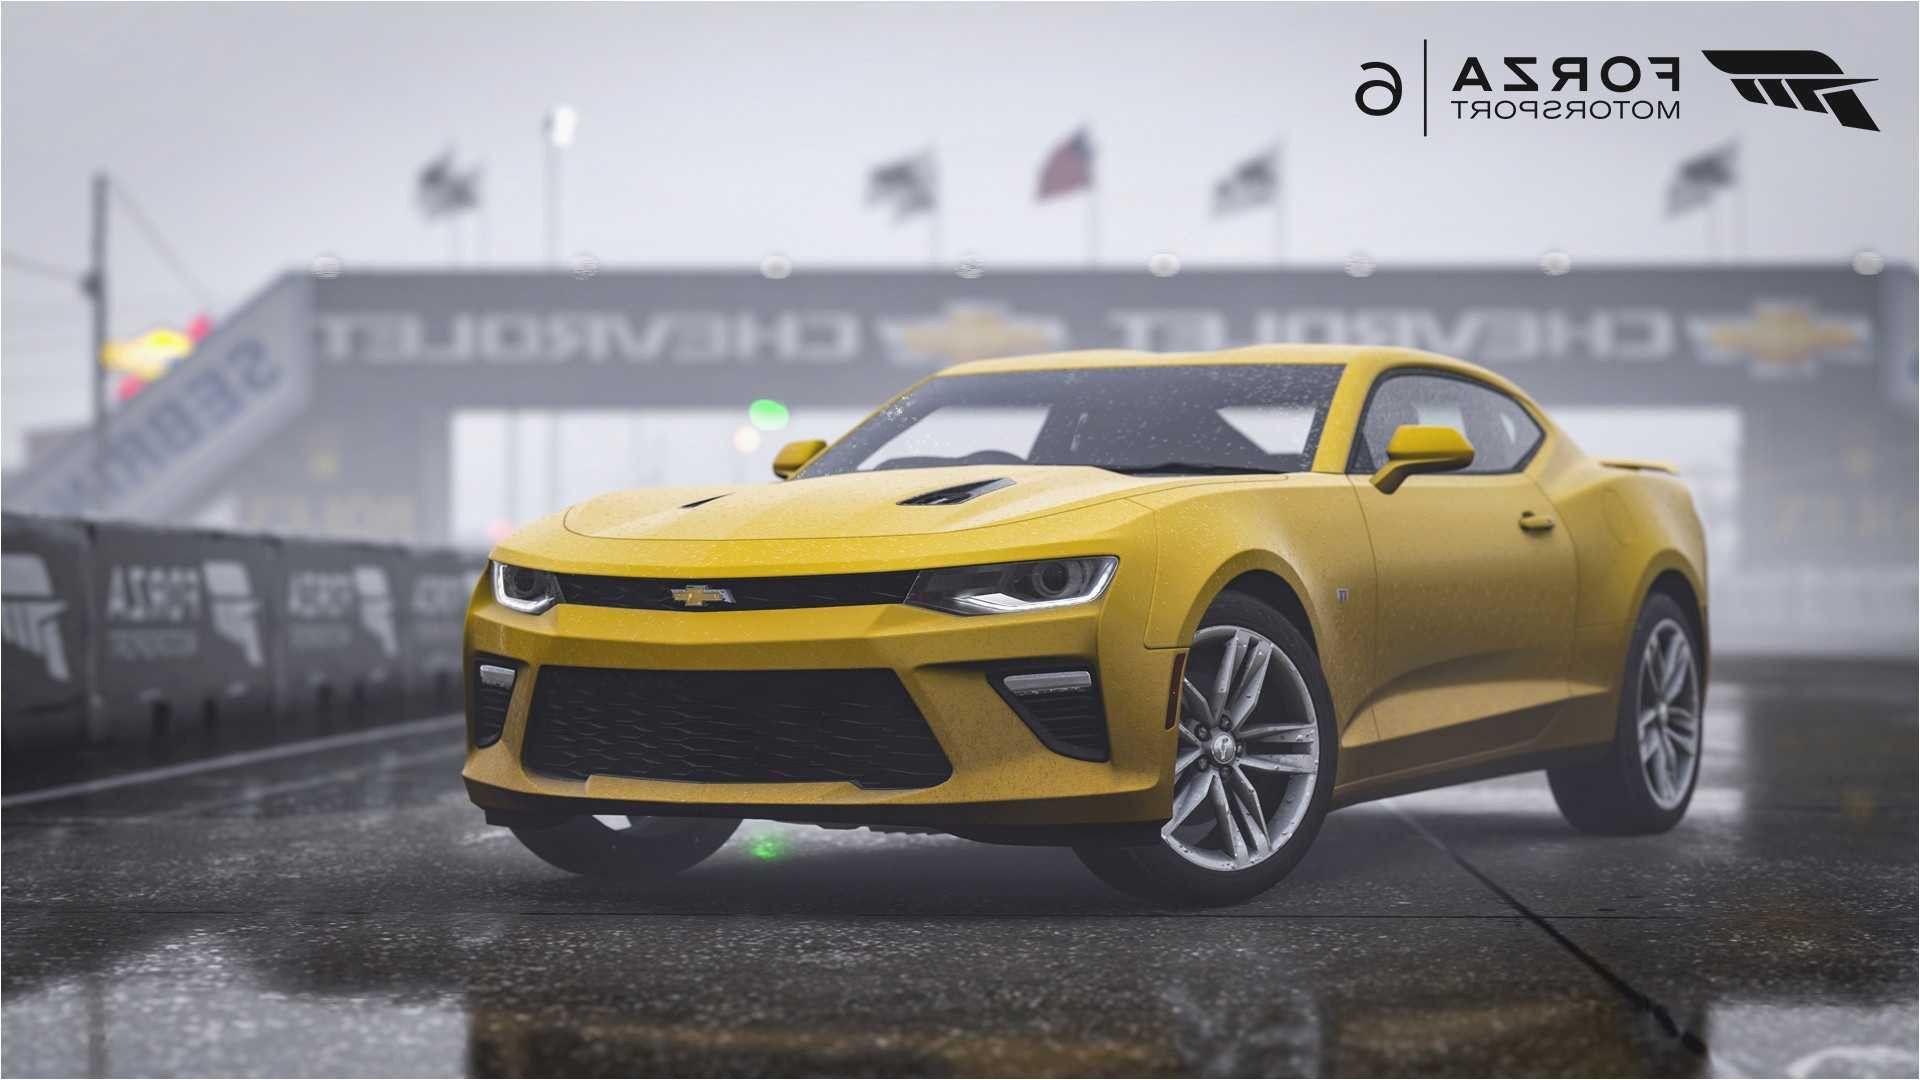 2020 Camaro Z28 Horsepower Check more at http//www